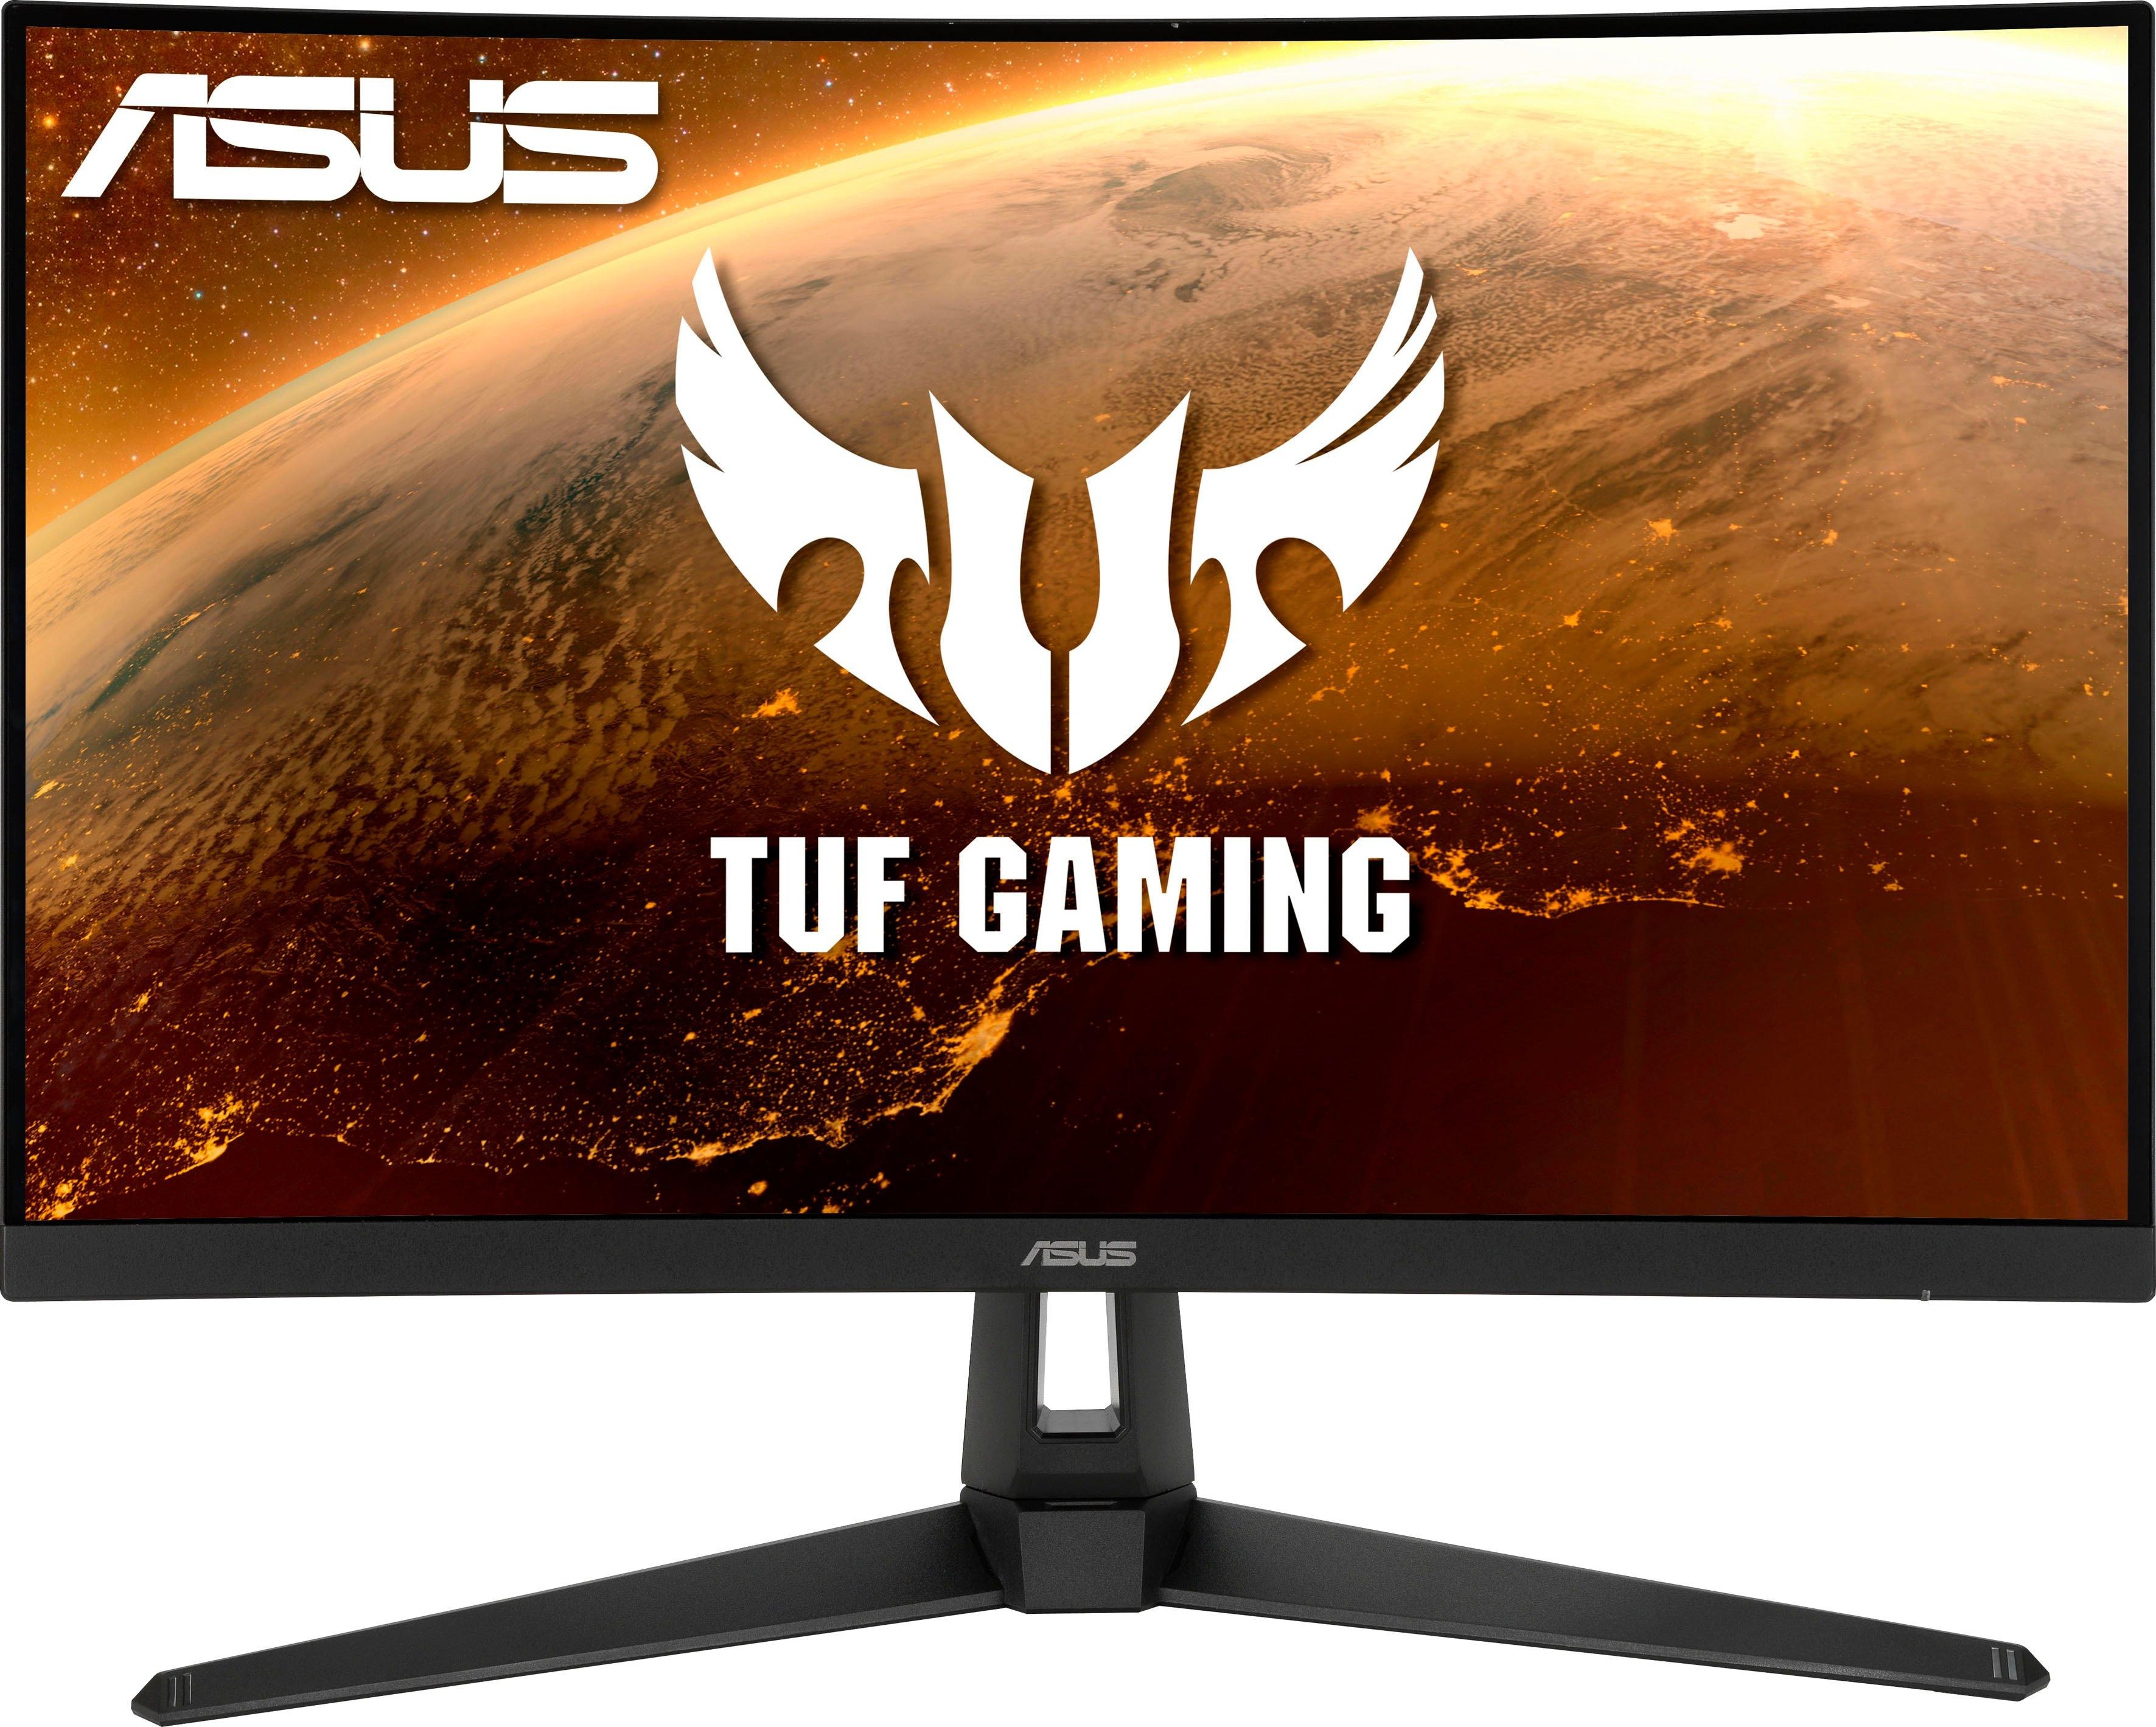 Asus gaming-monitor VG27WQ1B, 68,6 cm / 27